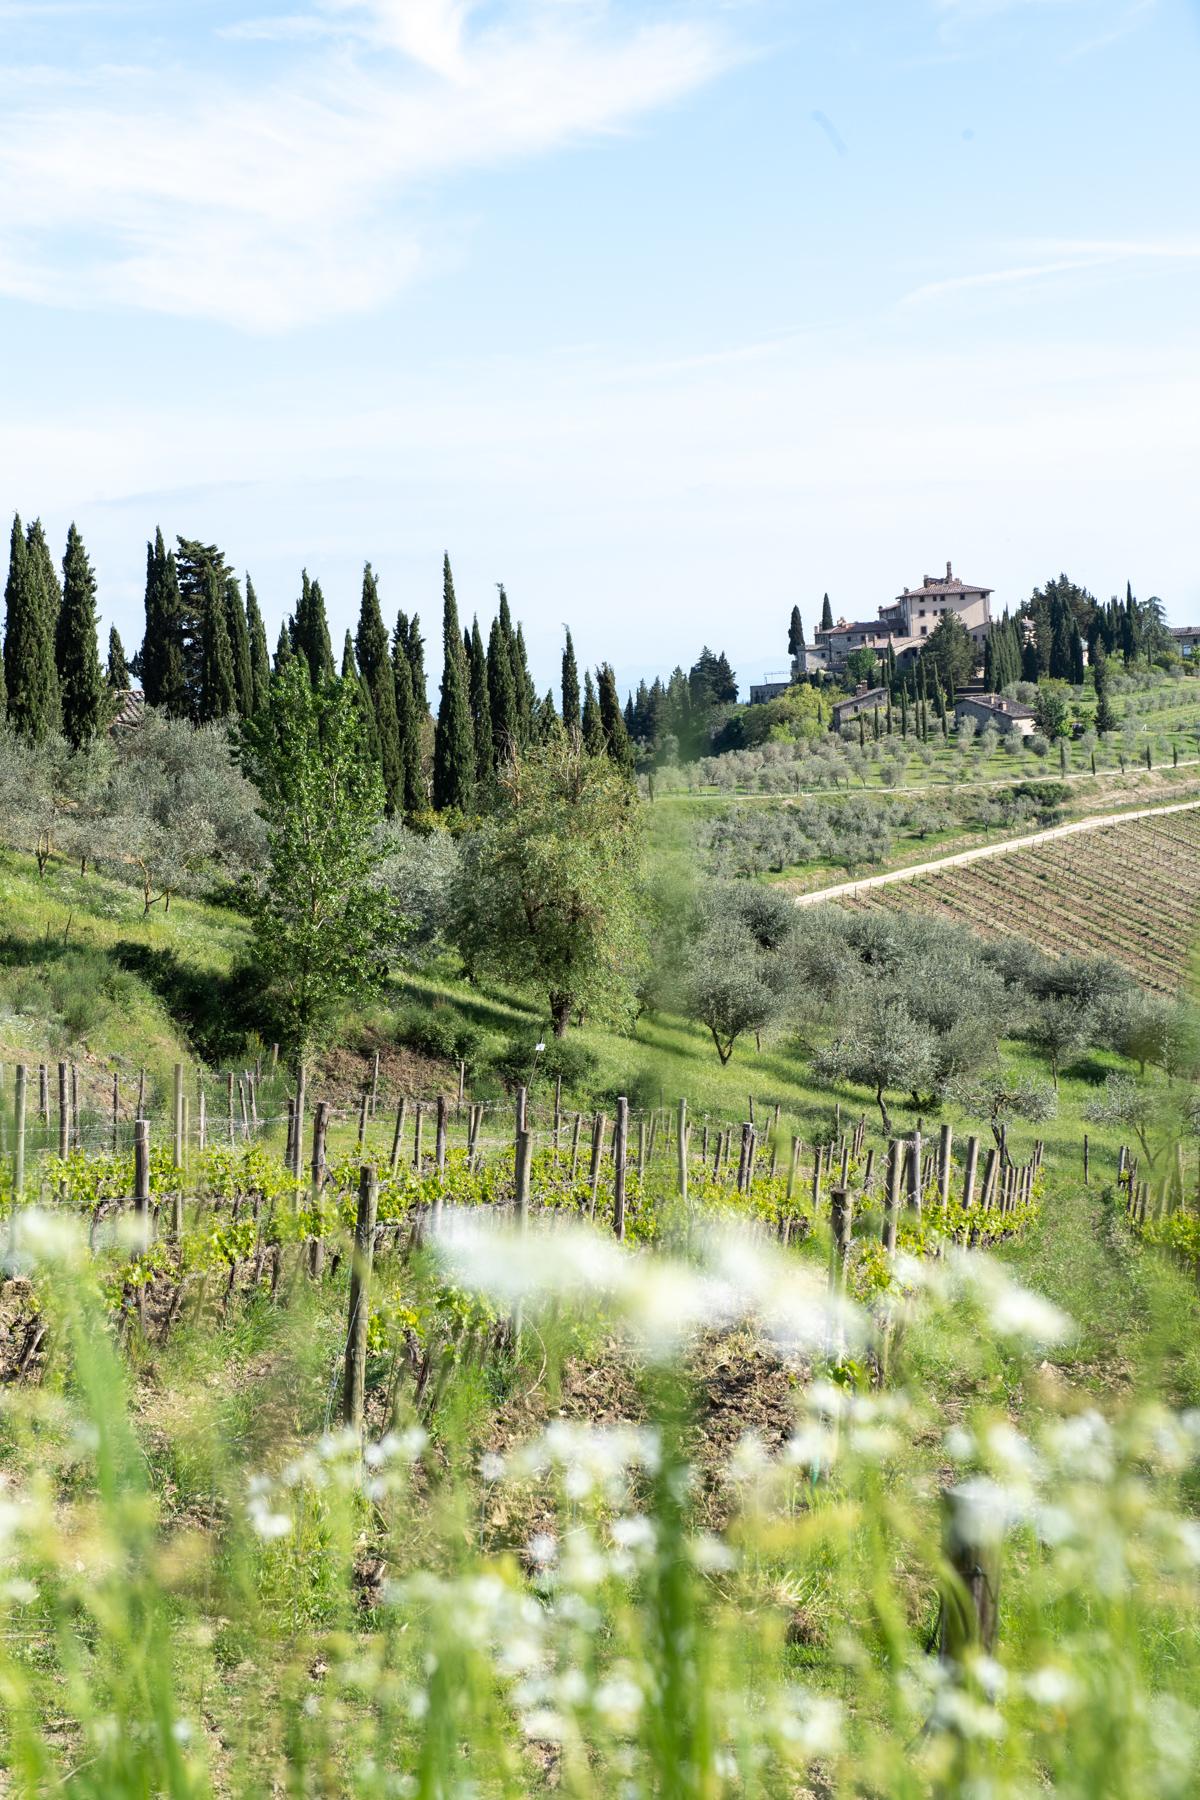 Stacie Flinner x Cuvee Tuscan Farmhouse Tuscany Italy Guide-82.jpg